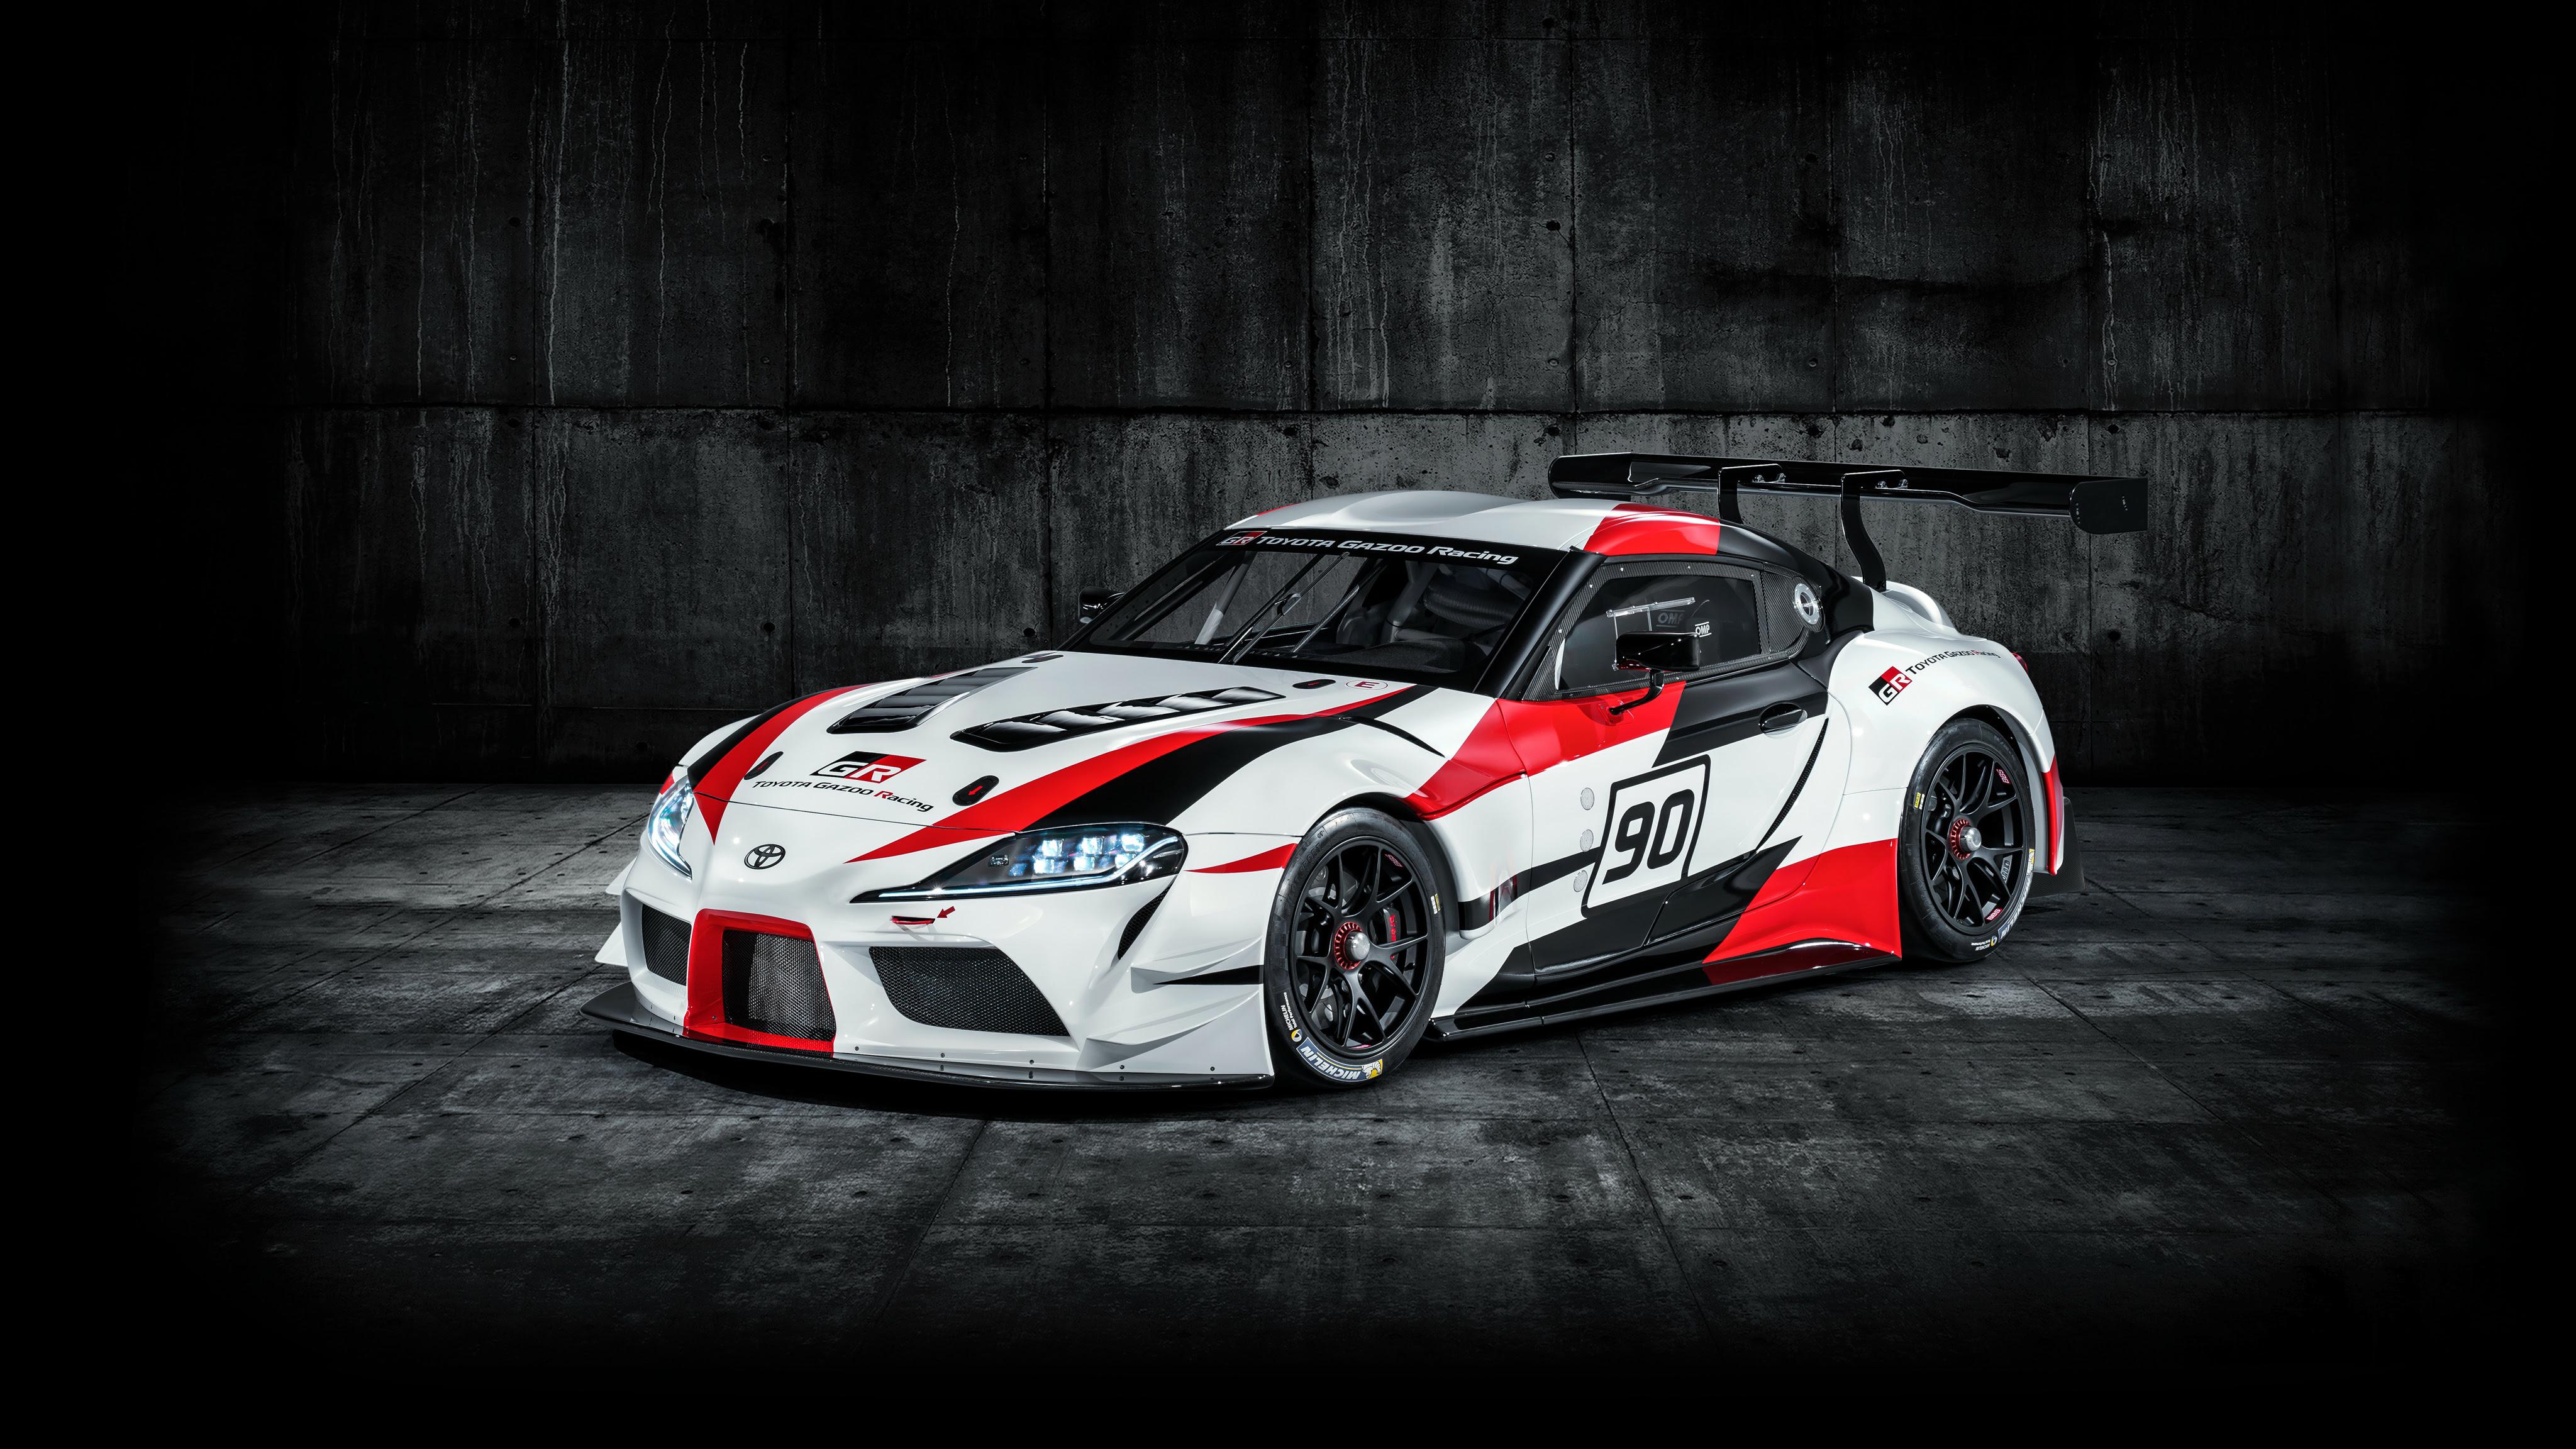 2018 Toyota GR Supra Racing Concept 4K 3 Wallpaper | HD ...